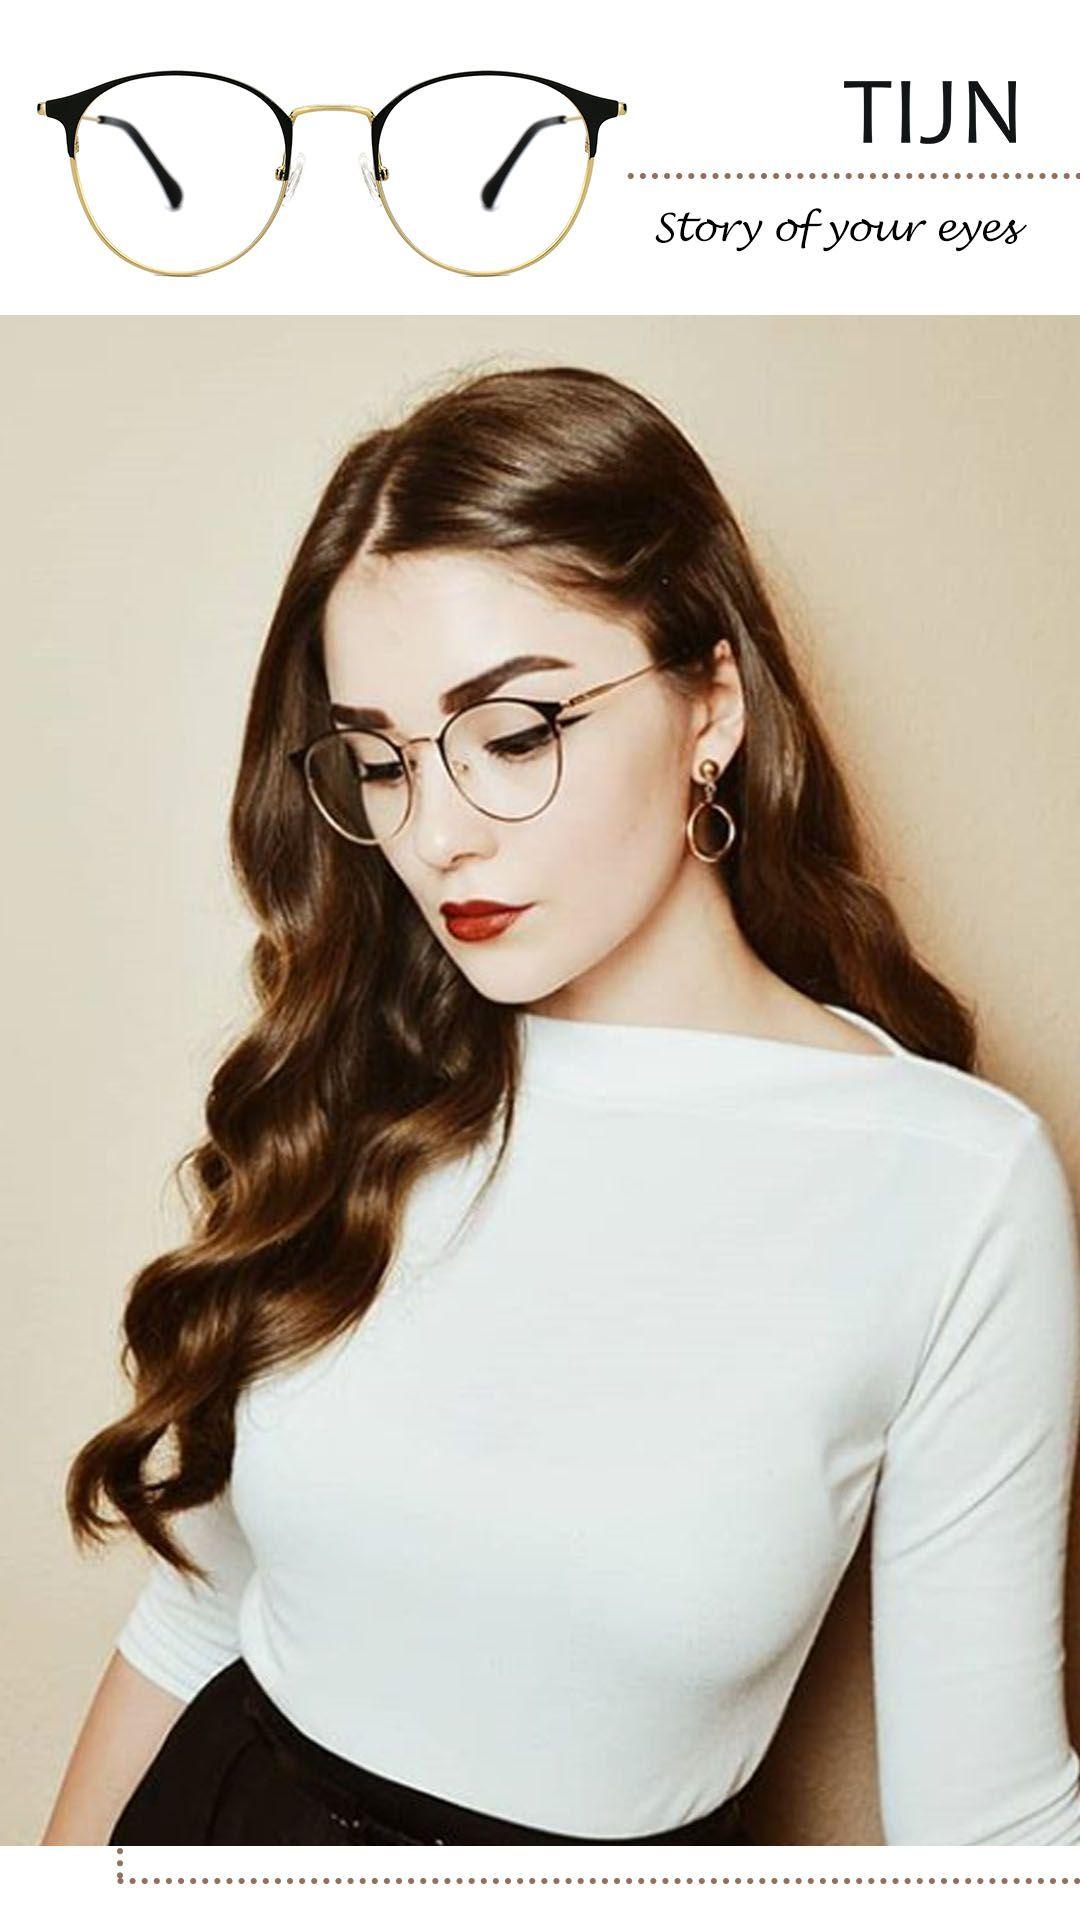 221c94c664 Eyewear Trends Women NEW Fashion. You may get a new look.Top sale glasses.   eyewear  fashion eyewear  sunglasses eye